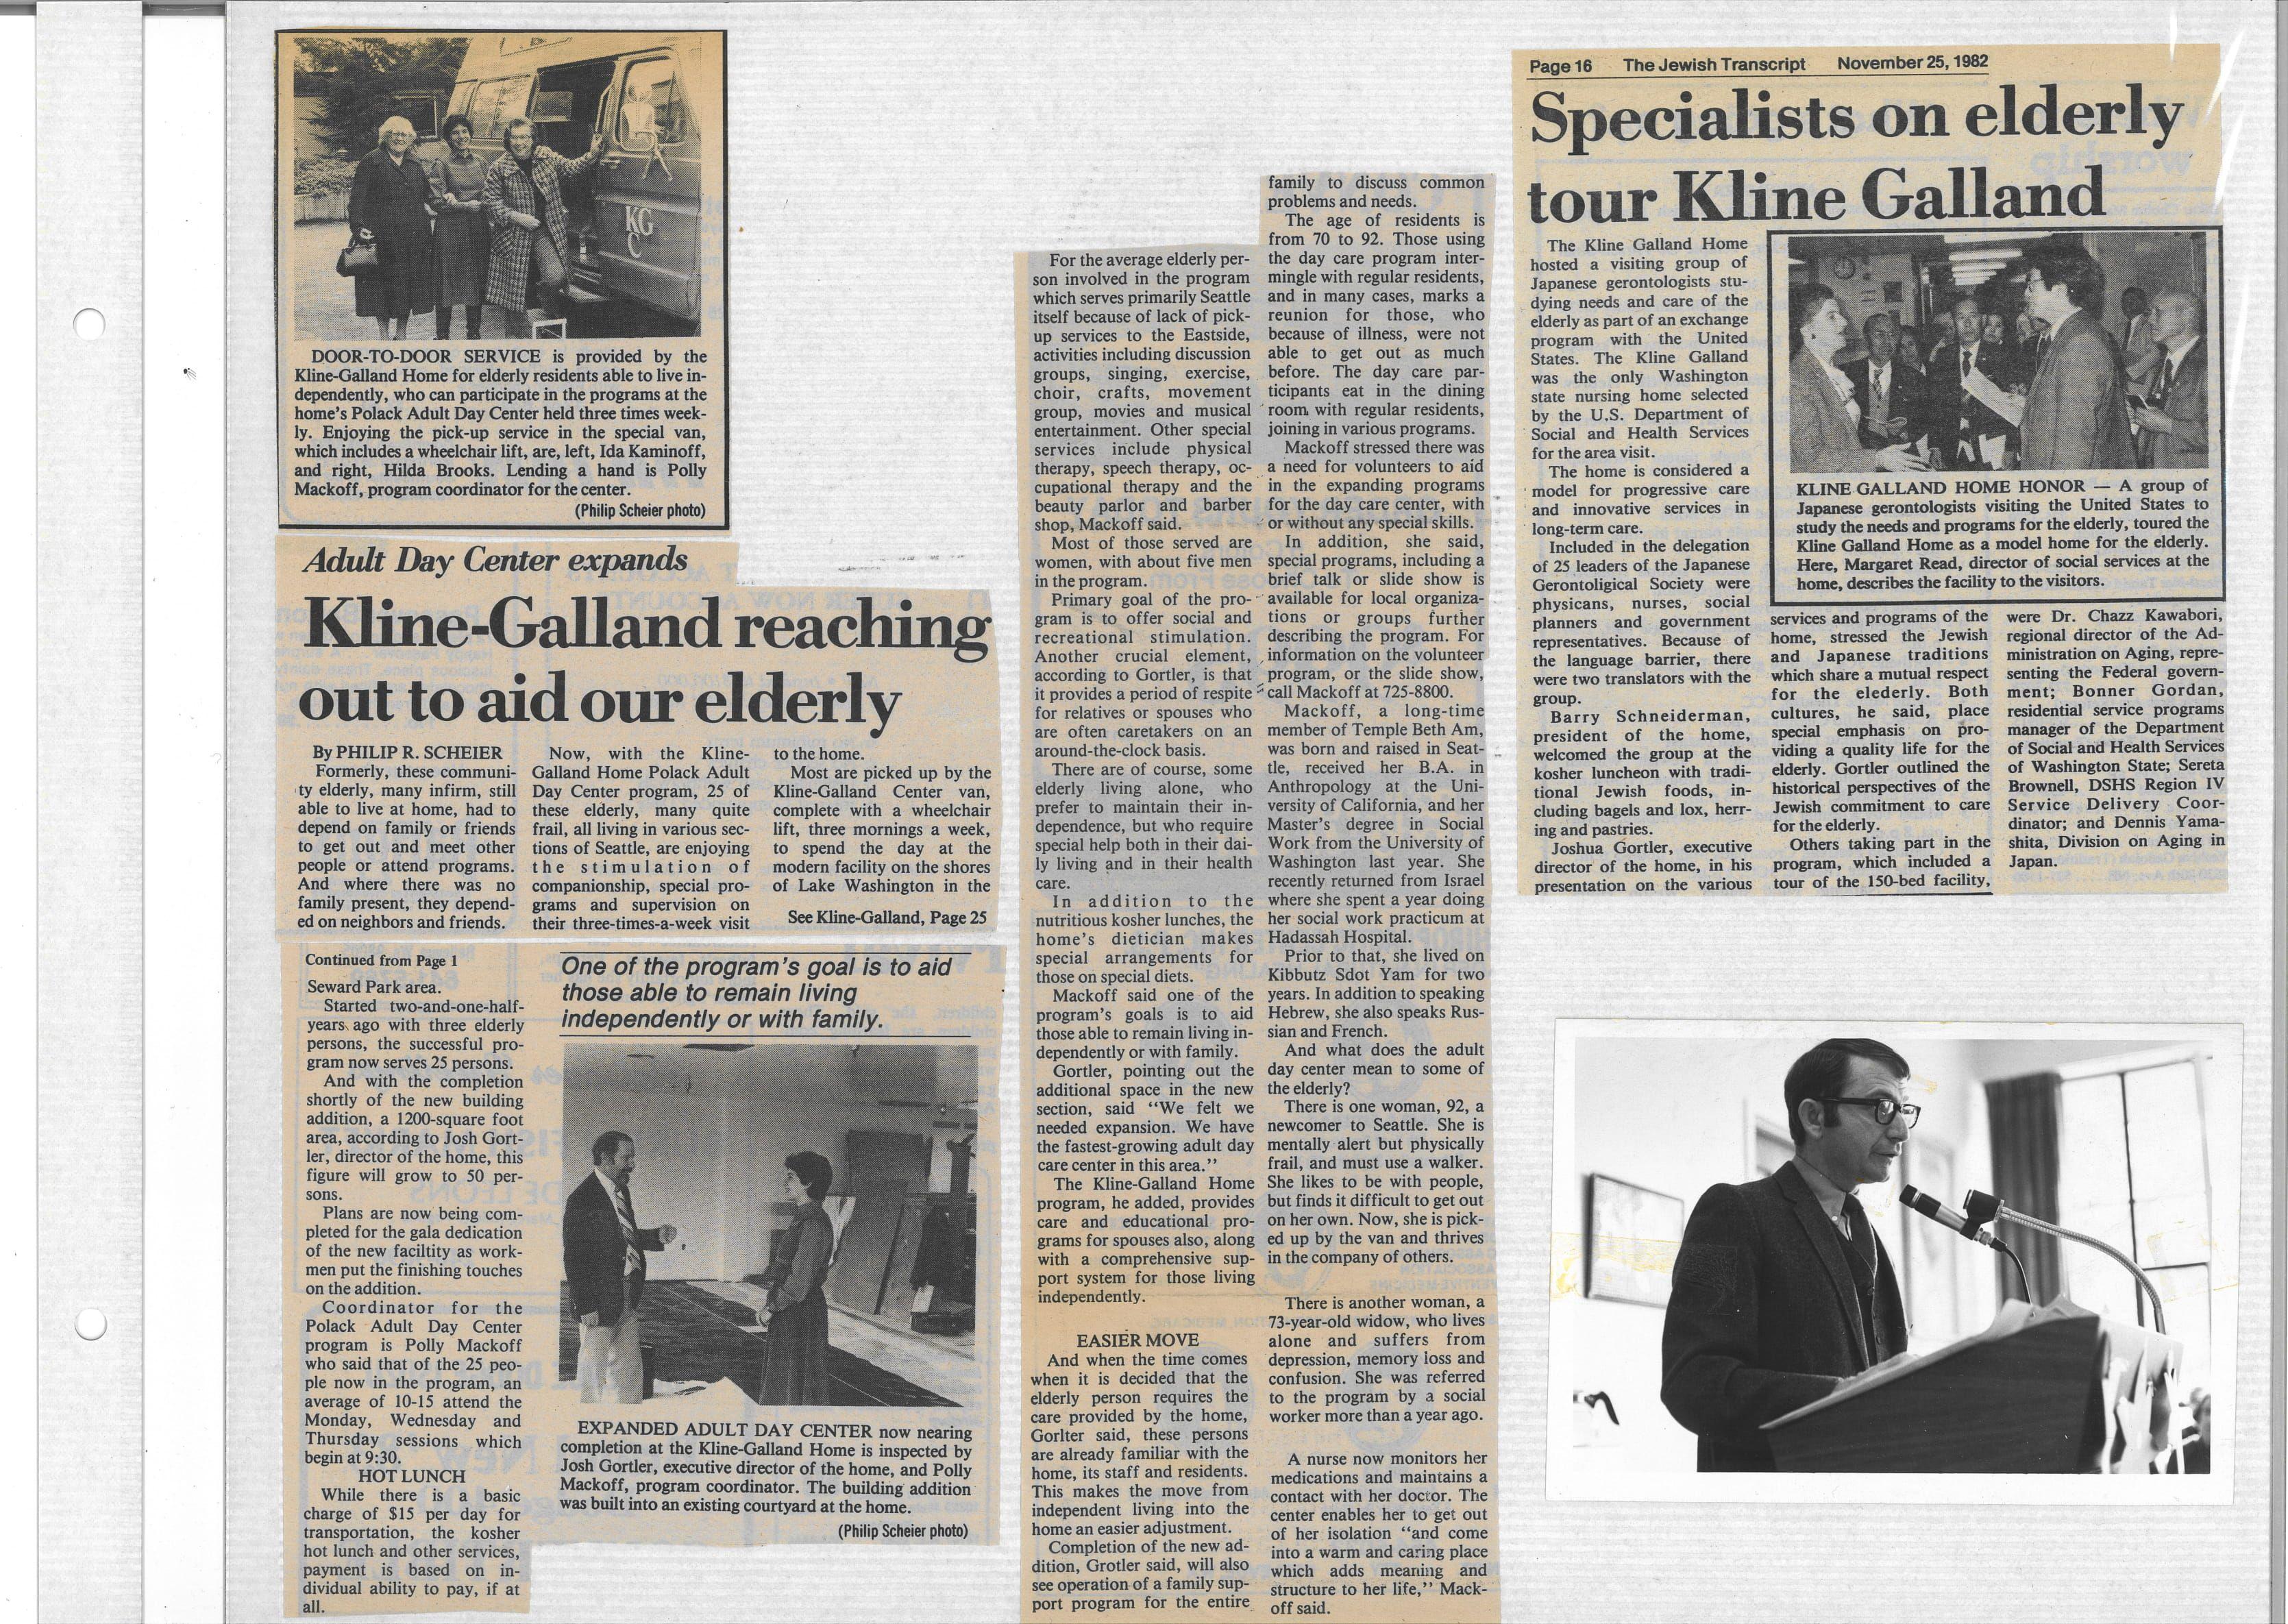 Newspaper clippings on Kline Galland (1982)